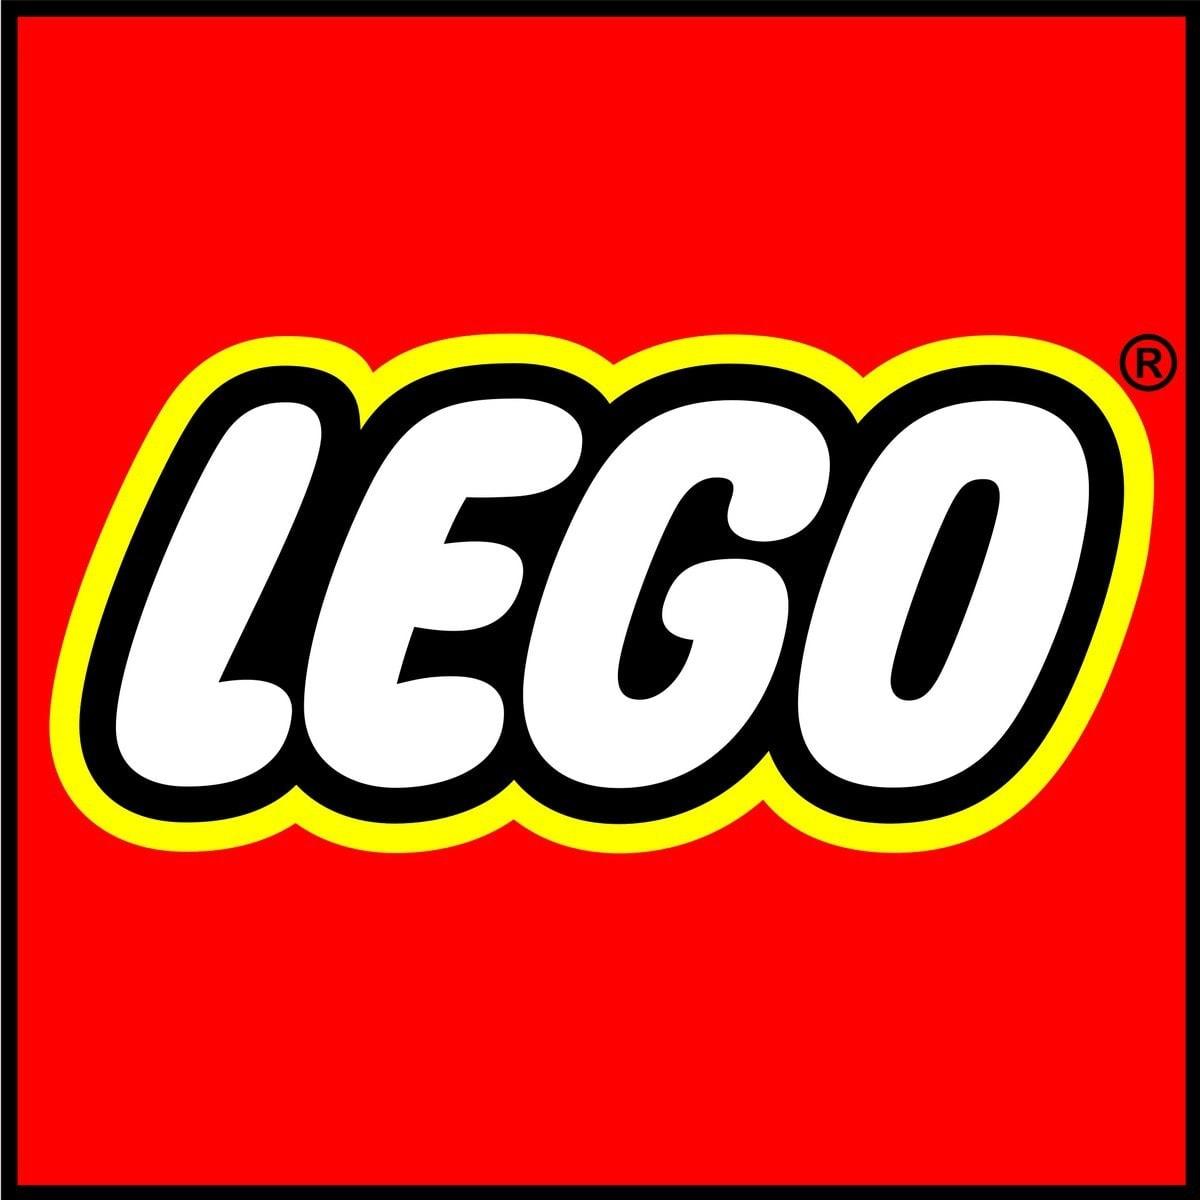 Lego Competitors